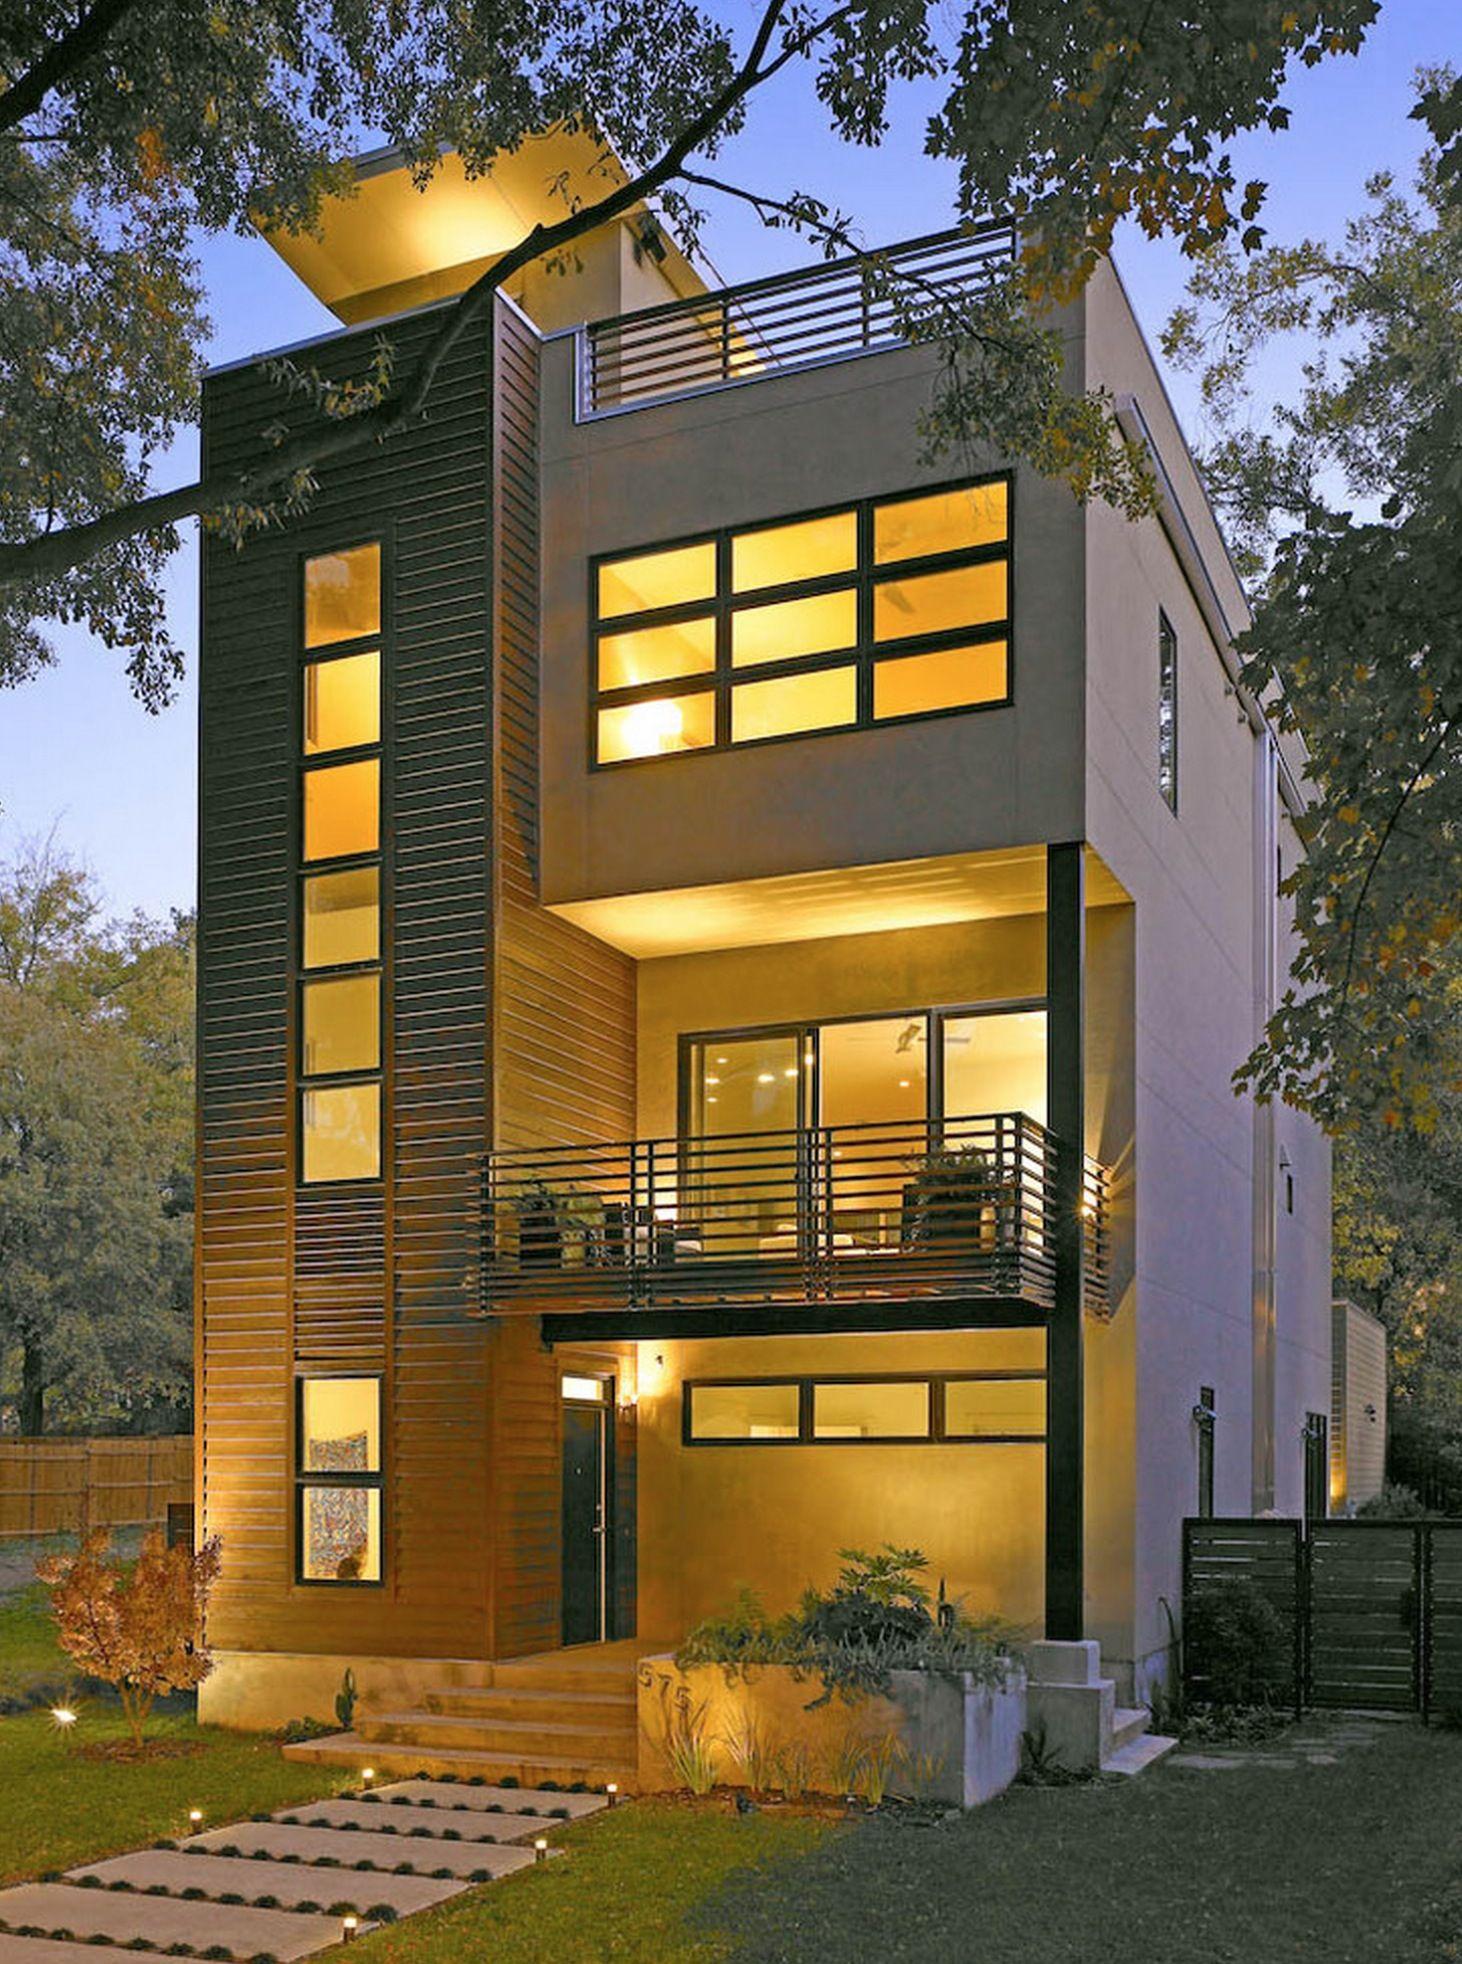 Exterior Design August 2014 48 | Exterior | Pinterest | Moderne ...